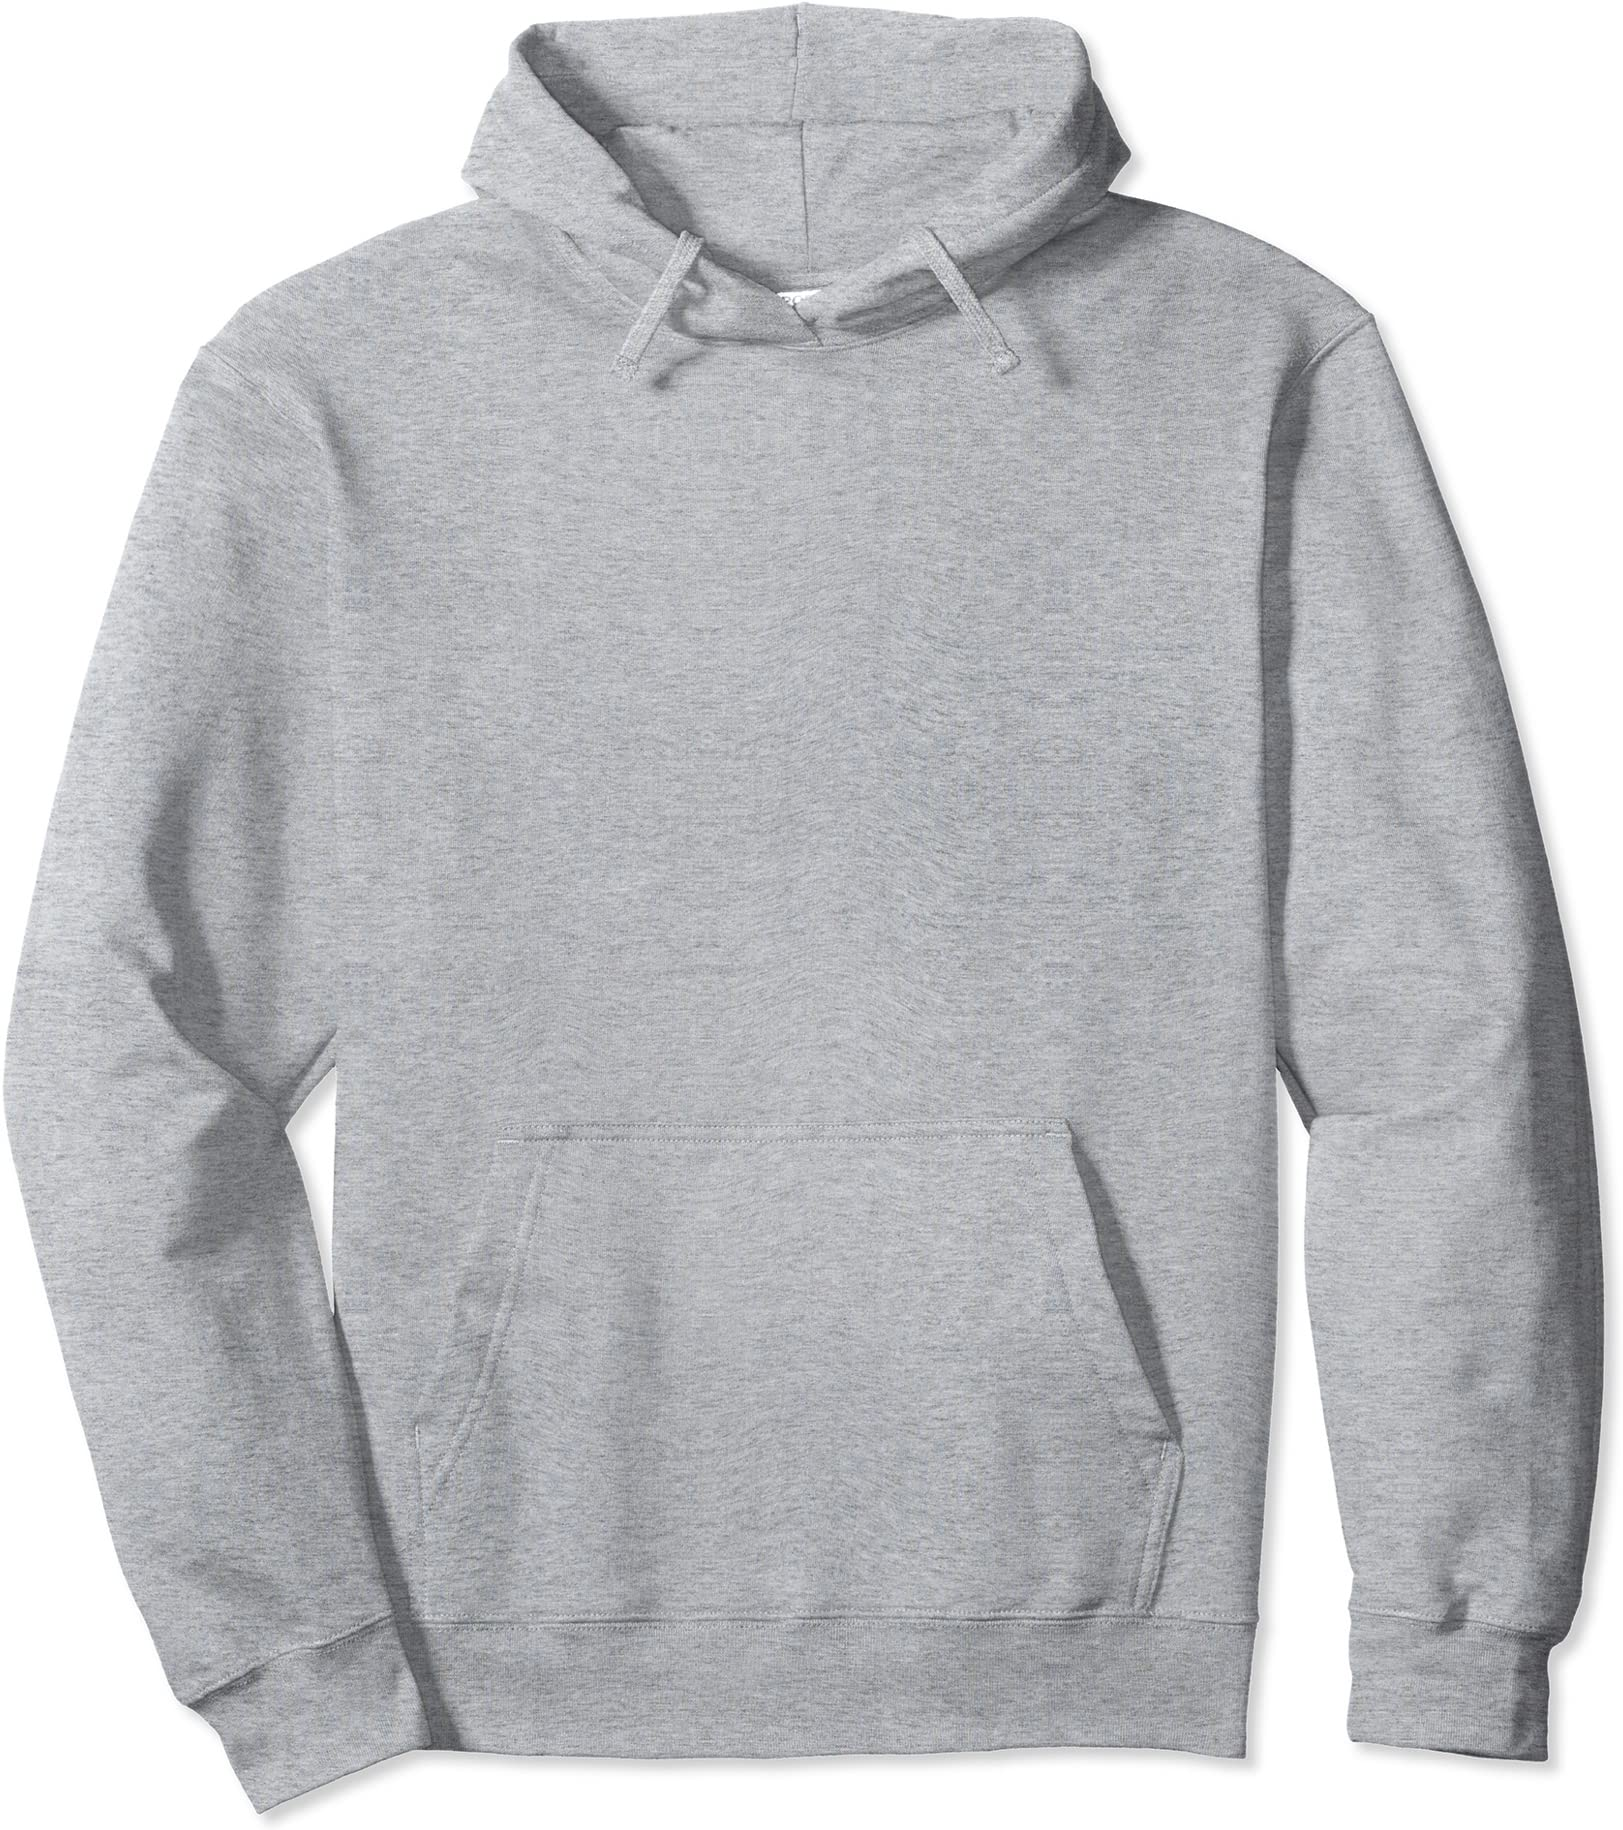 FOECBIR Keep Talking Im Diagnosing You Girl Sweatshirts Pullover Hoodie with Pocket